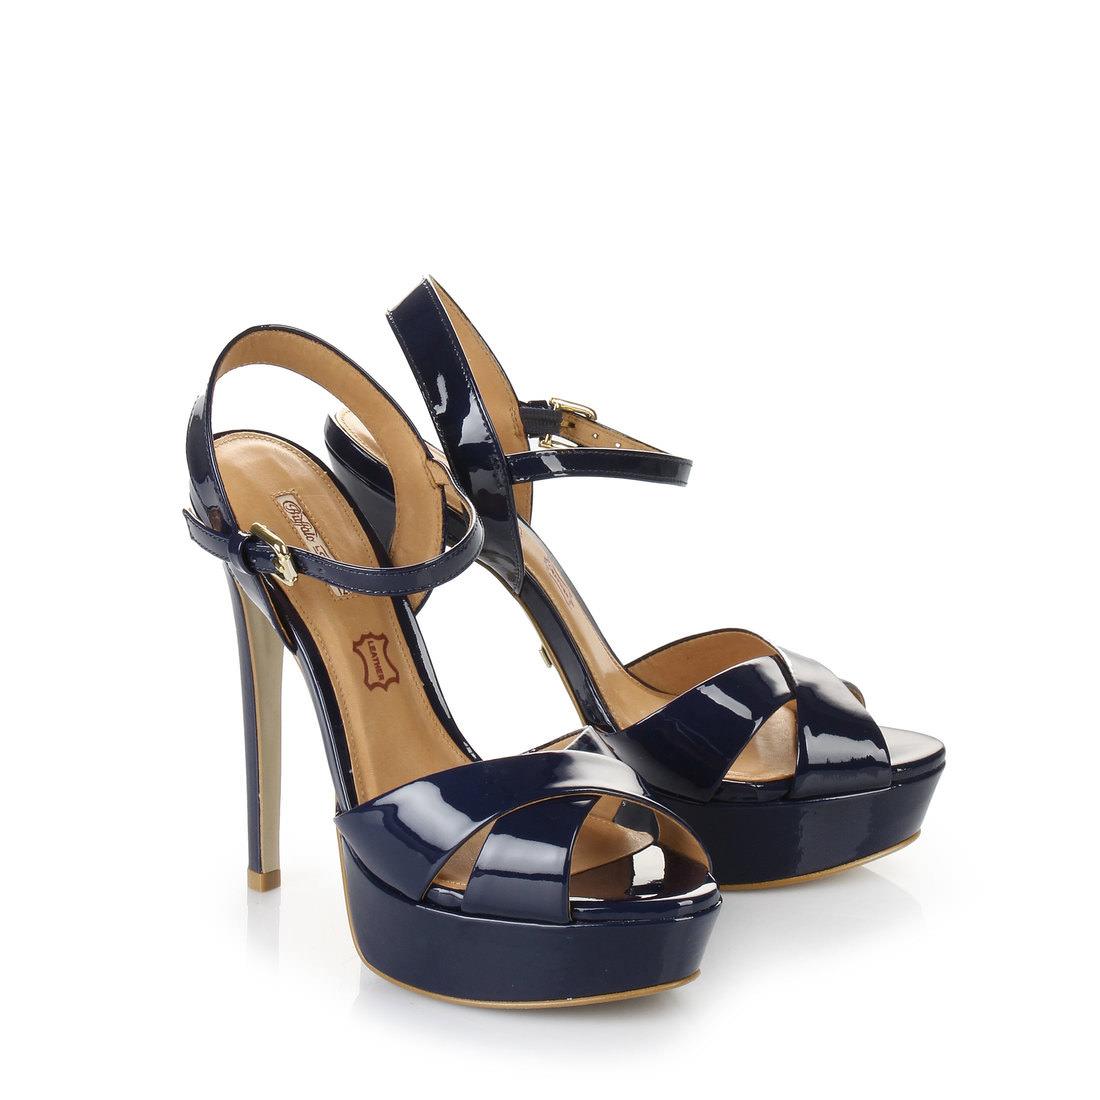 buffalo plateau sling back sandals in dark blue buy online in buffalo online shop buffalo. Black Bedroom Furniture Sets. Home Design Ideas